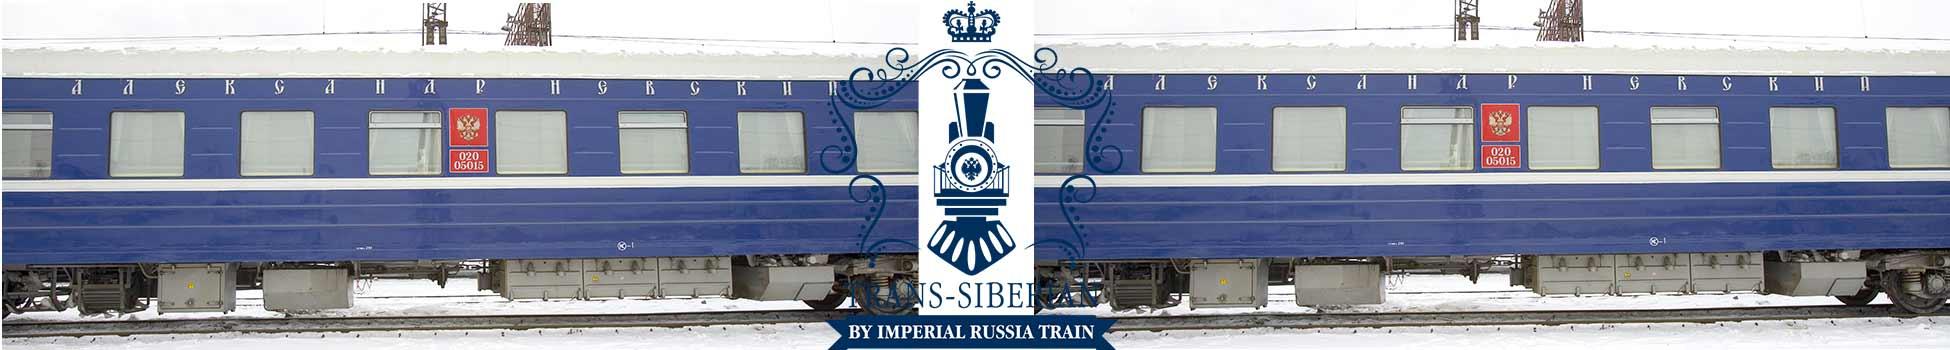 Sonderzug Imperial Russia